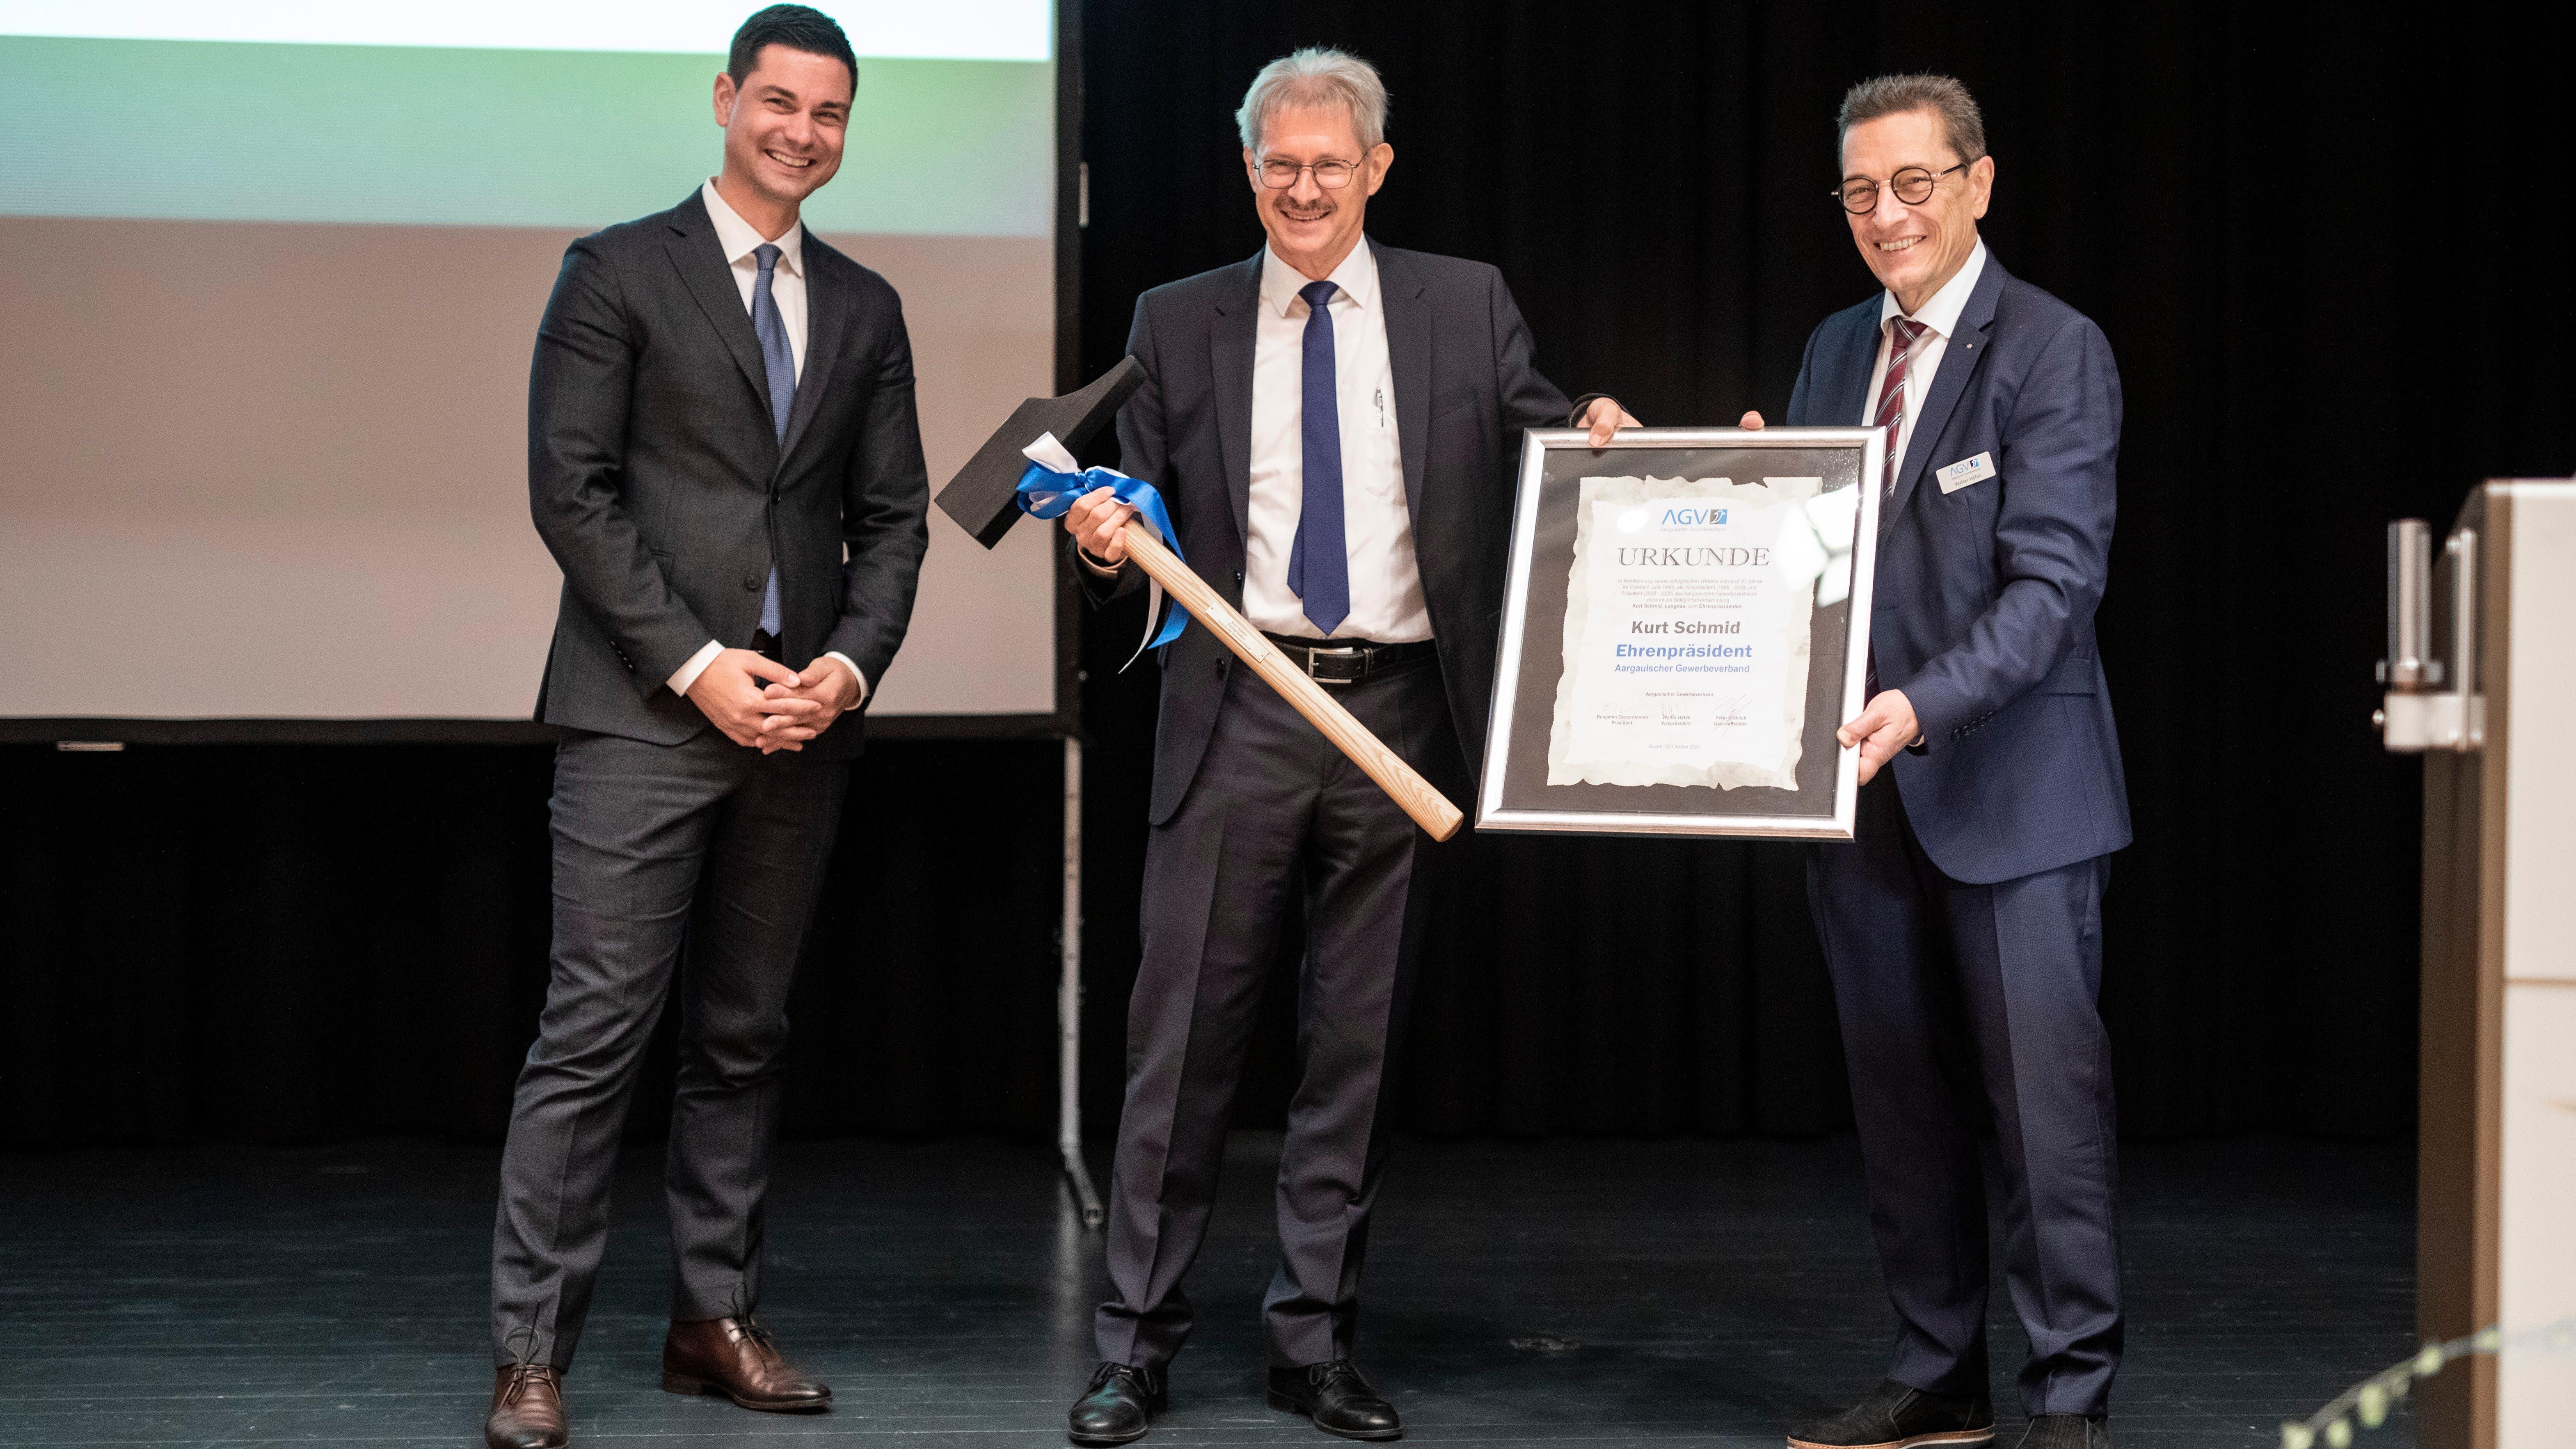 Kurt Schmid (CVP) übergibt sein Amt an SVP-Nationalrat Benjamin Giezendanner (links). Walter Häfeli (FDP) bleibt Vize-Präsident.